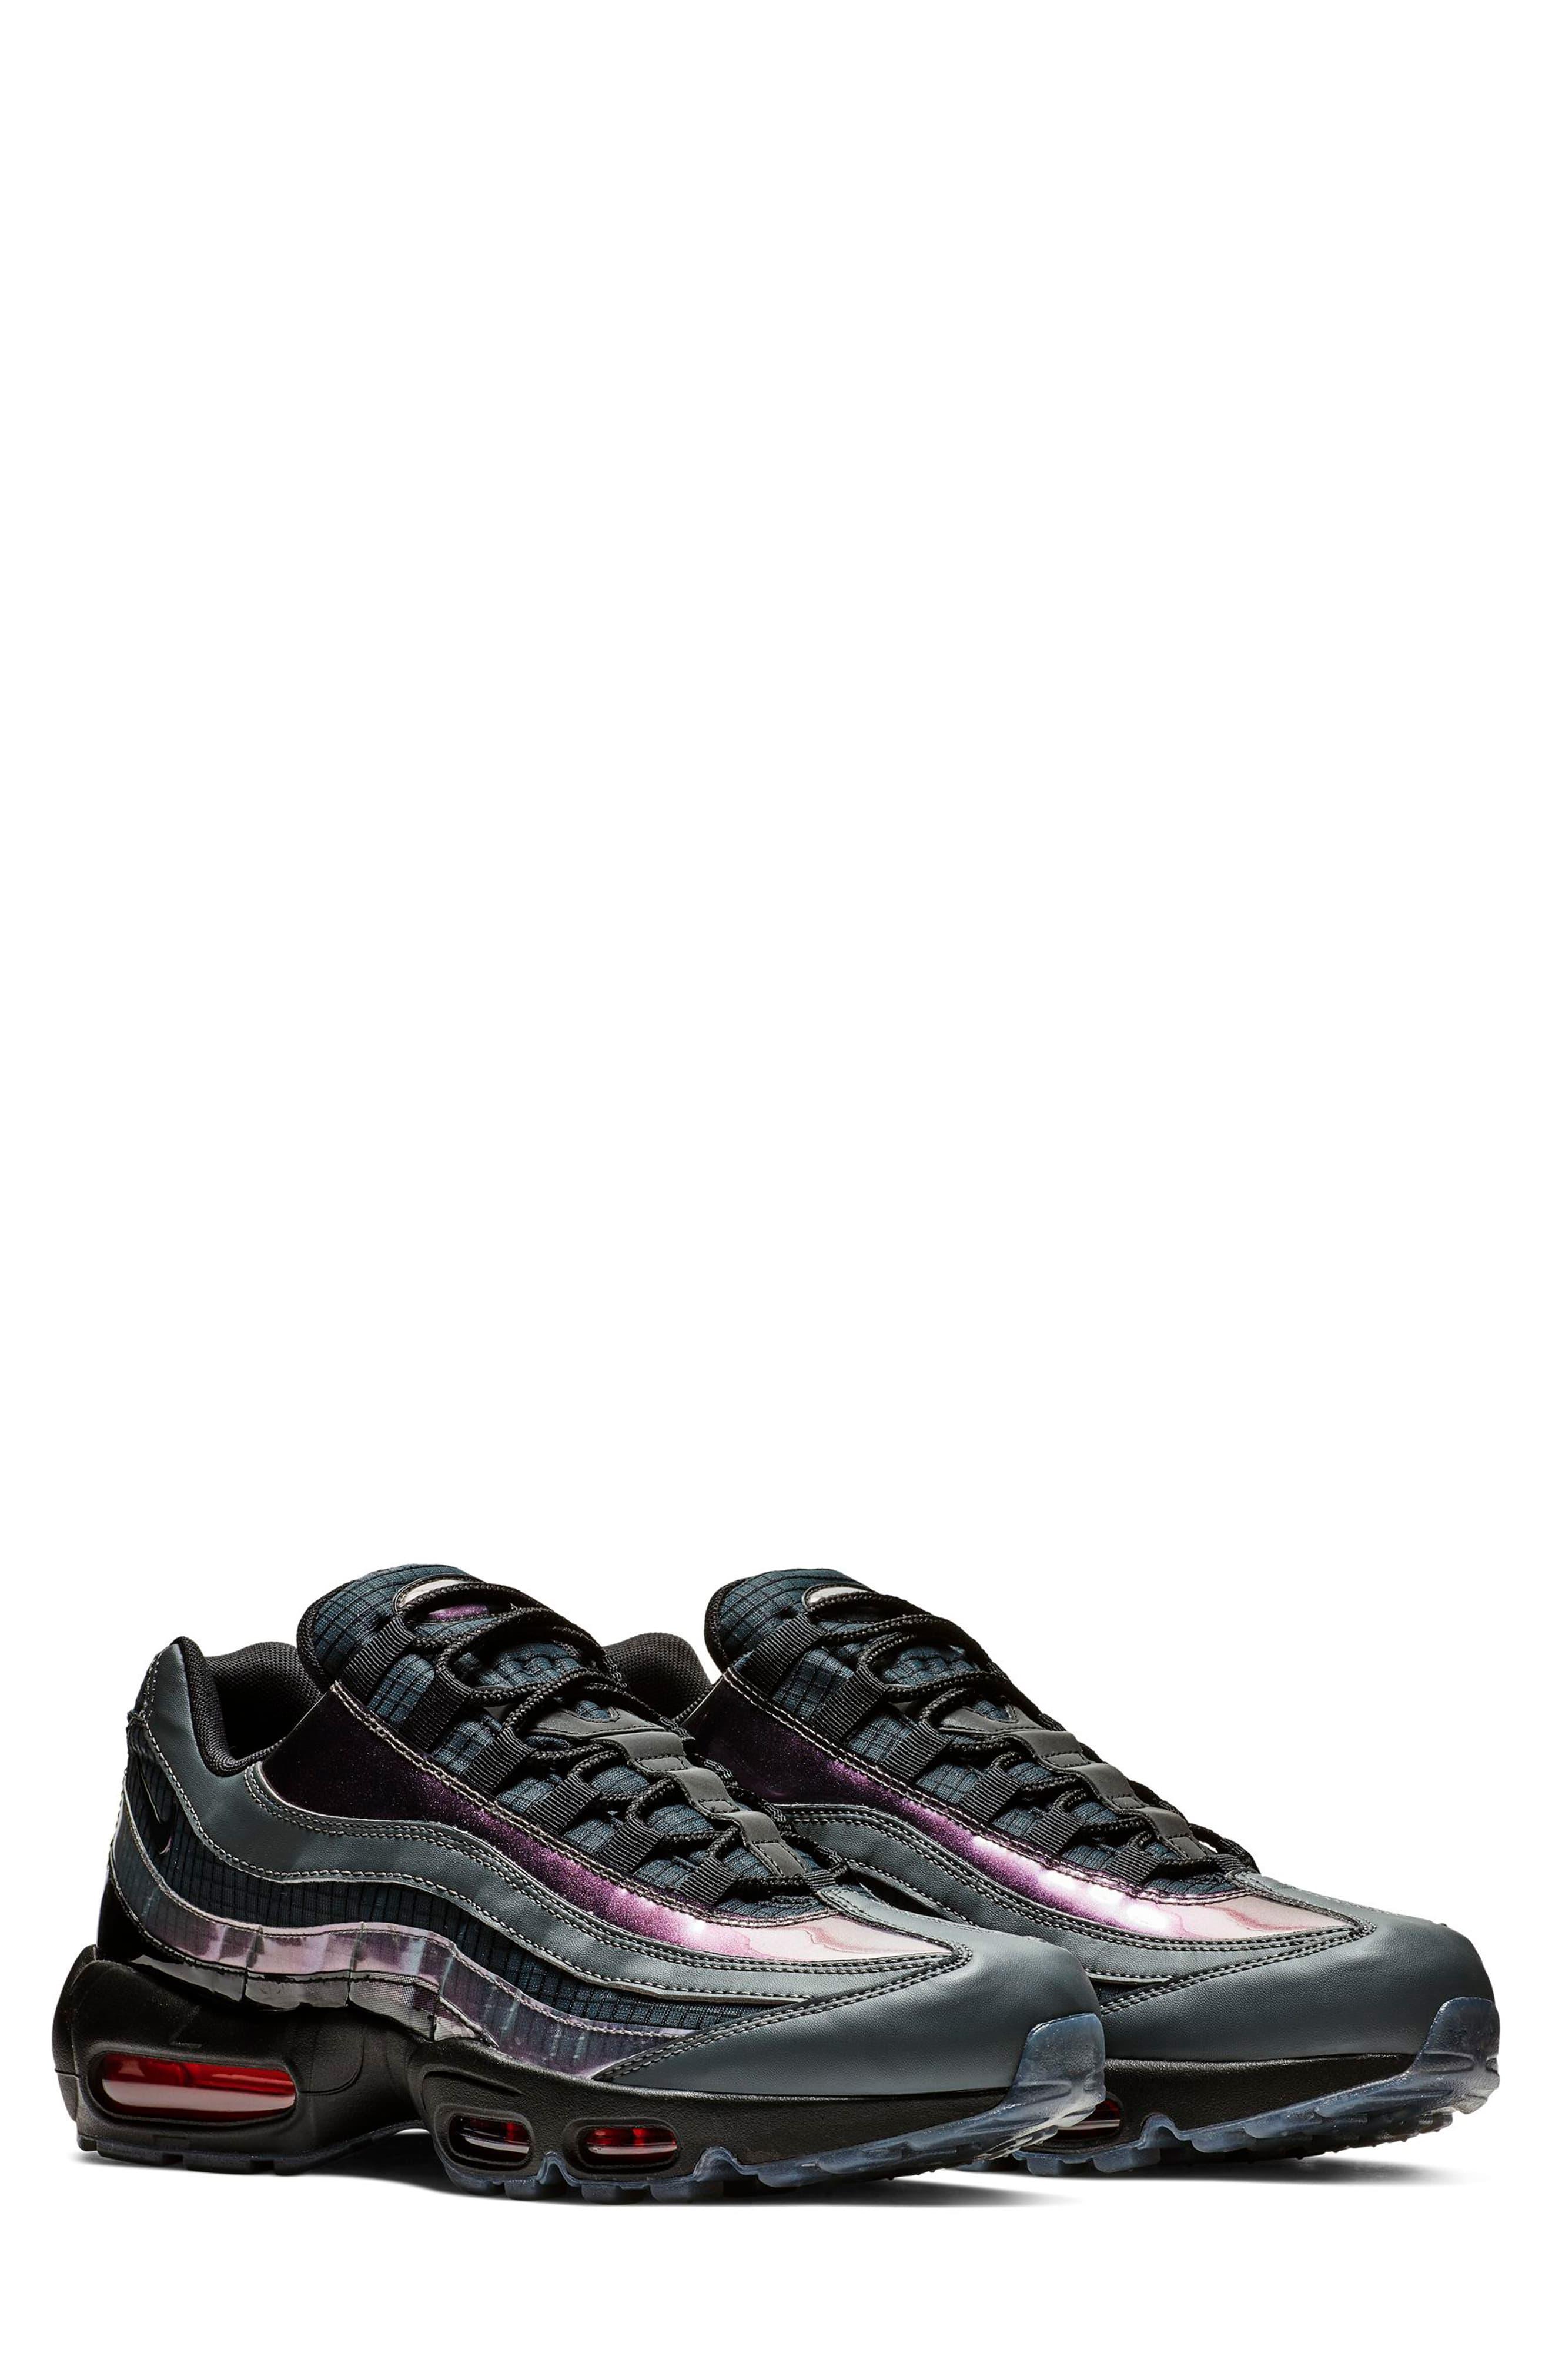 Nike Air Max 95 Lv8 Sneaker, Size Producten in 2019Air Producten in 2019 Air